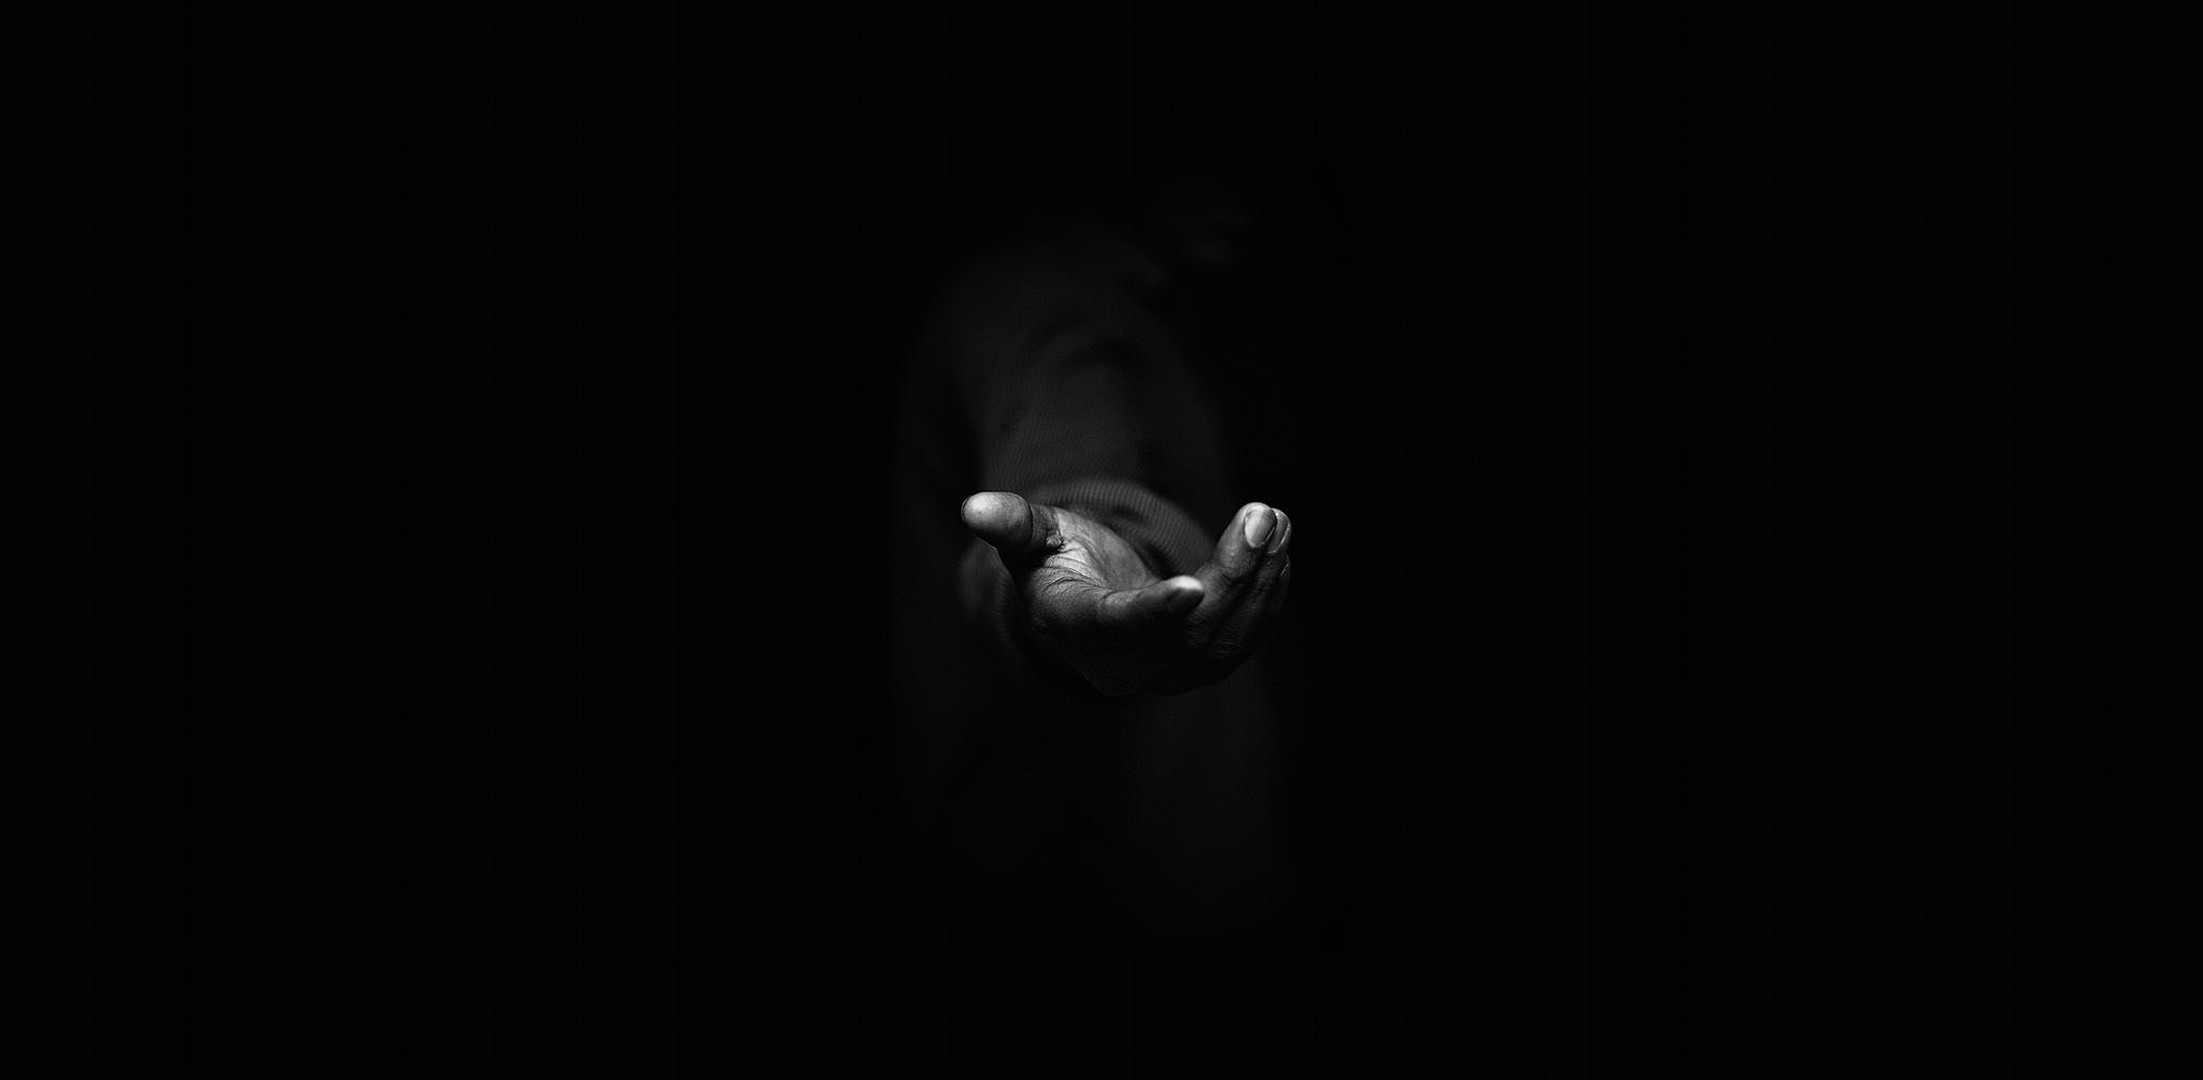 mystery man, hand, favor, black background, dark, fullscreen